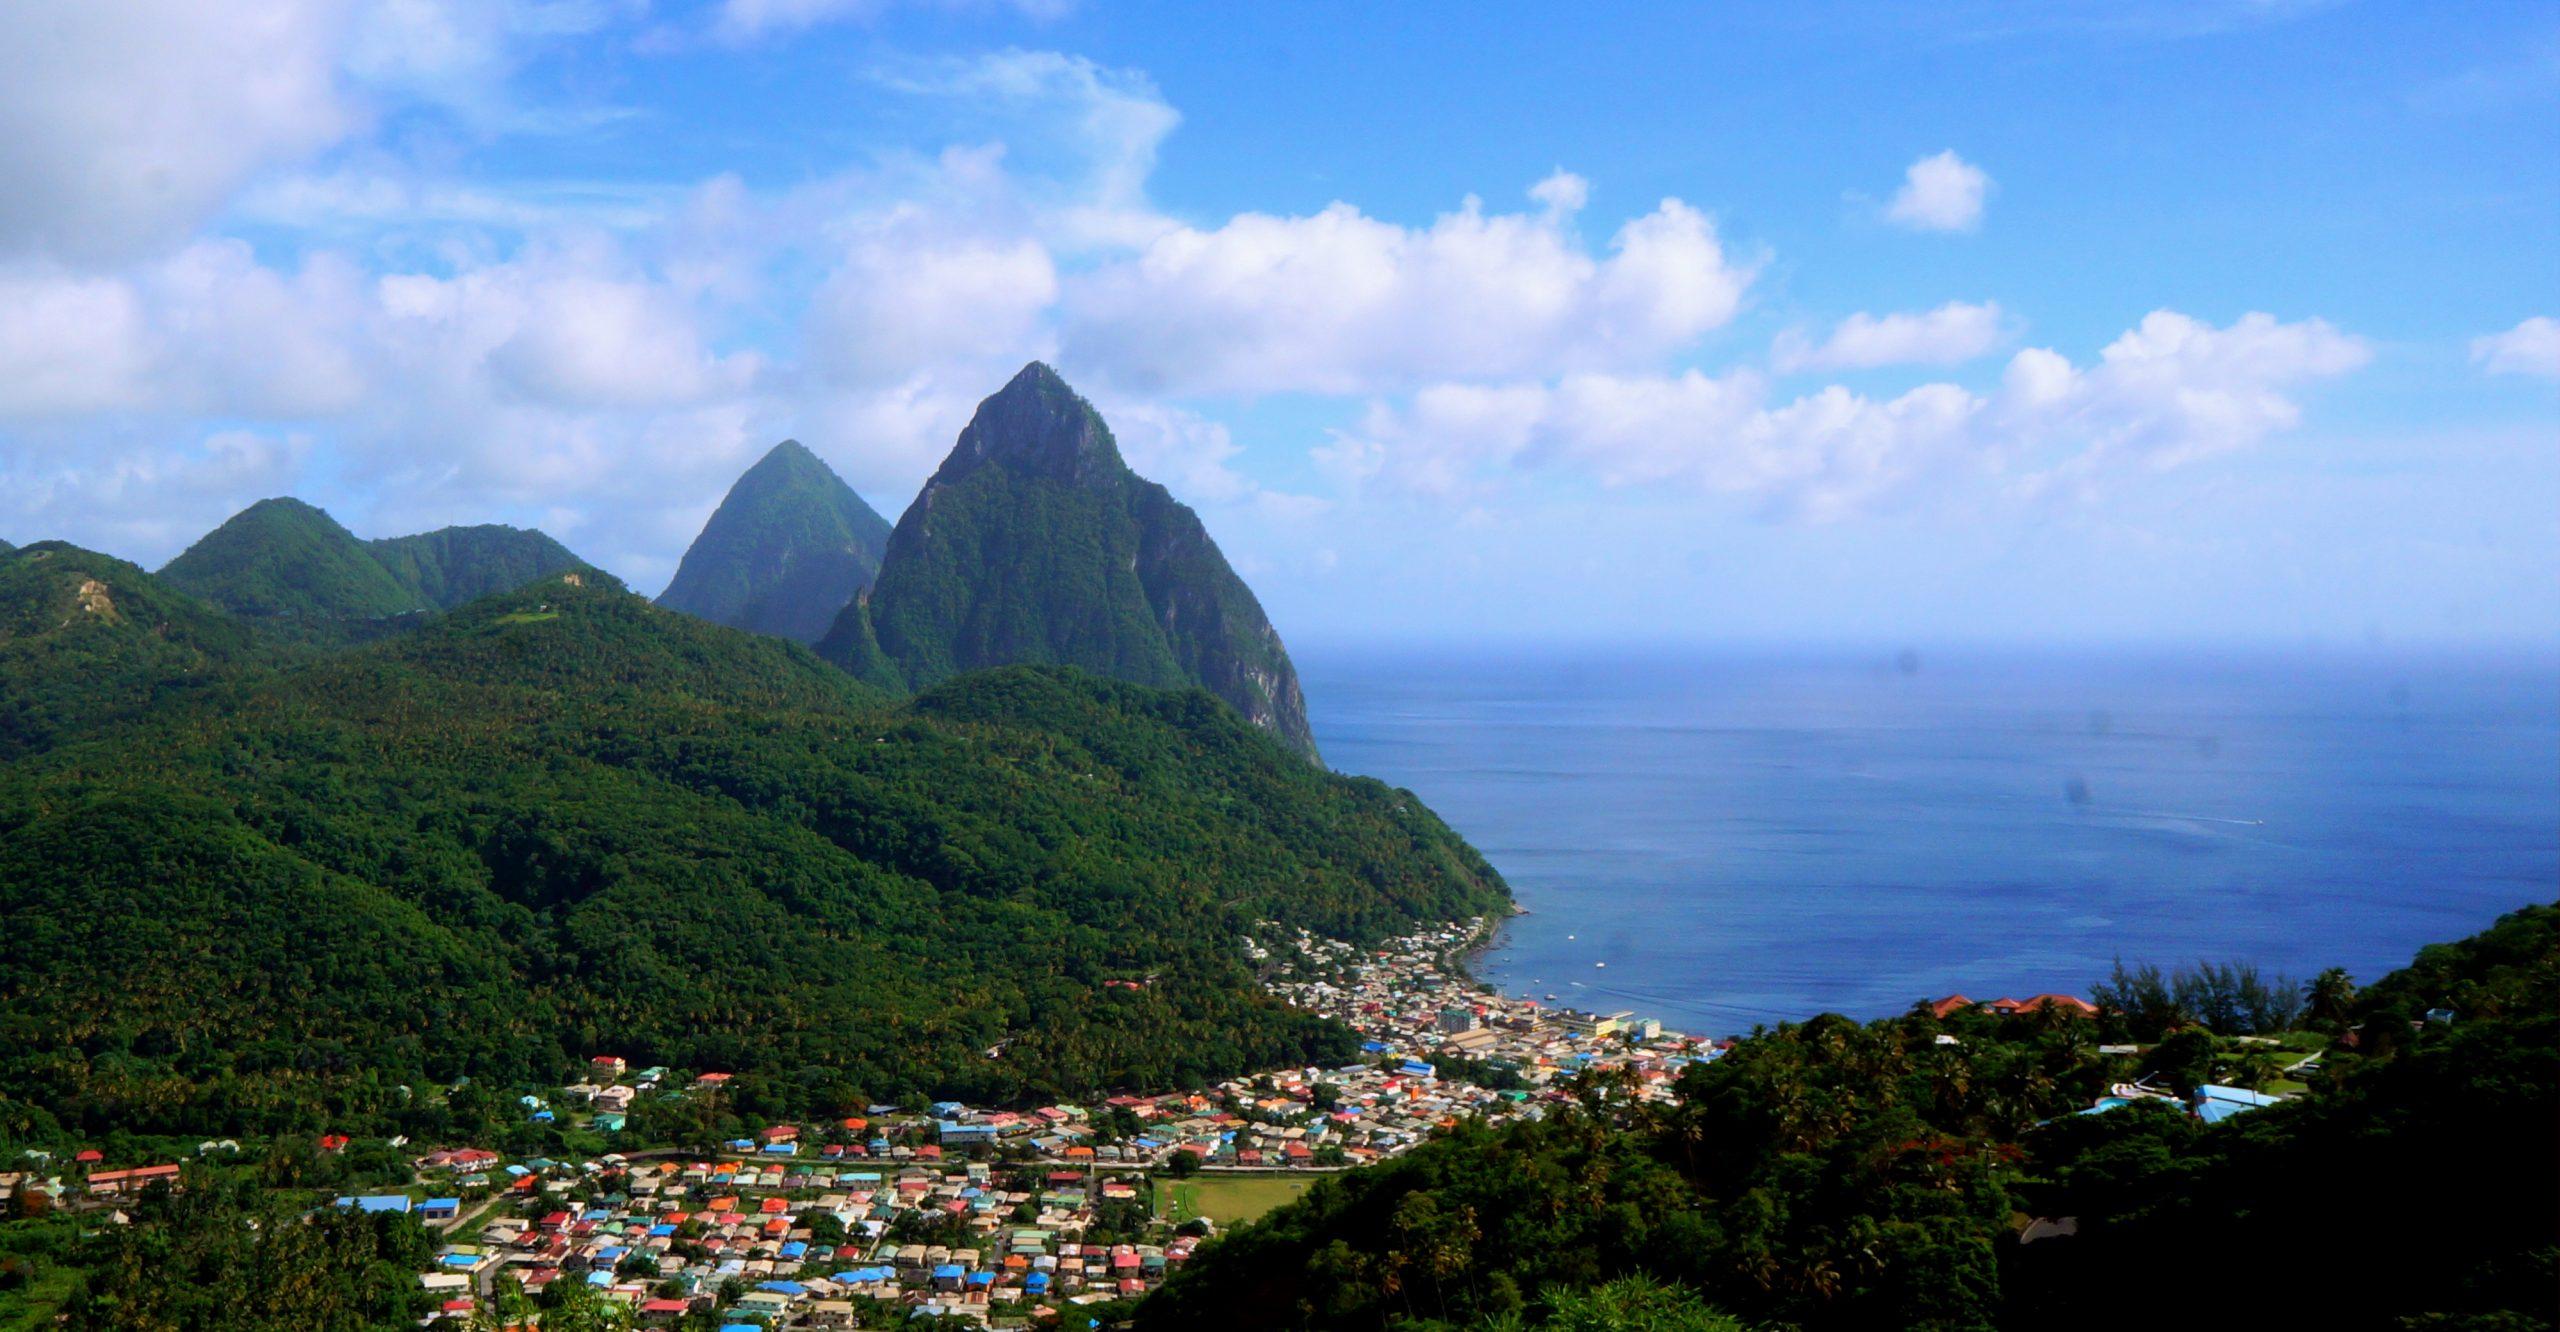 Hiking Gros Piton in Saint Lucia